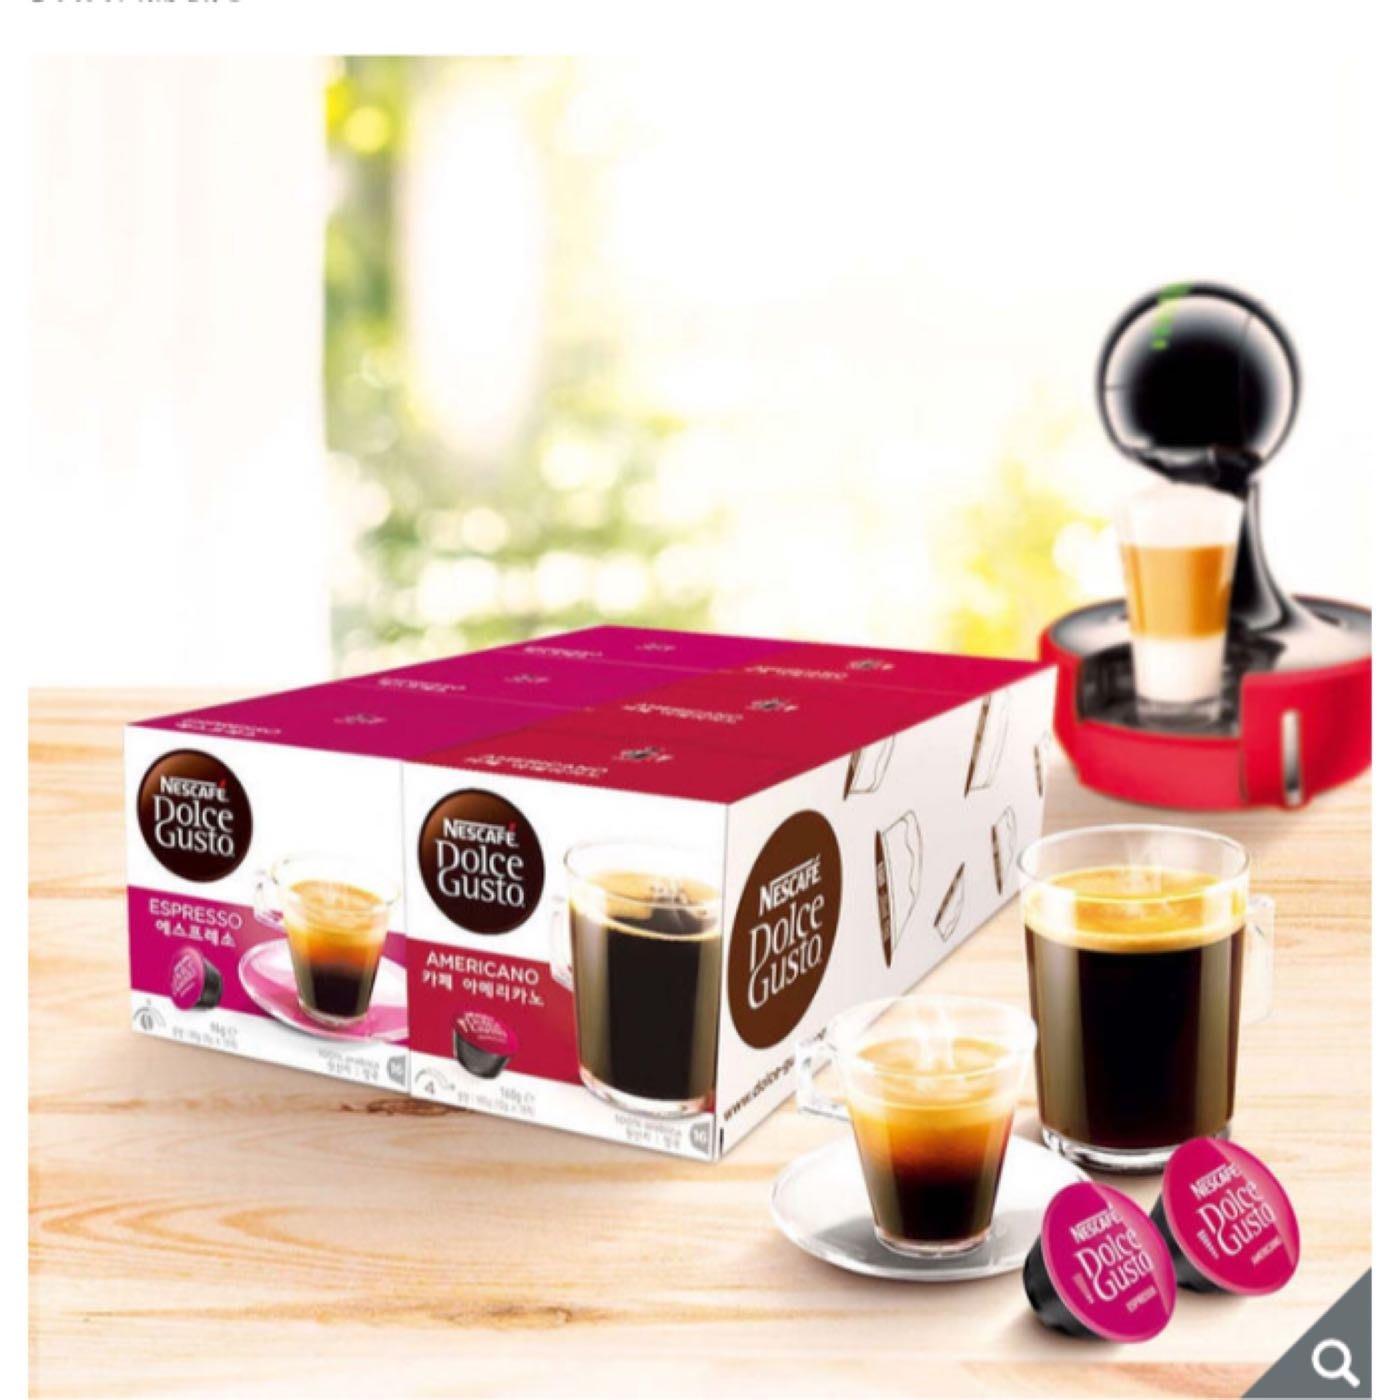 Dolce Gusto 雀巢義式+美式咖啡膠囊組 100%阿拉比卡豆(每盒16顆*6盒)